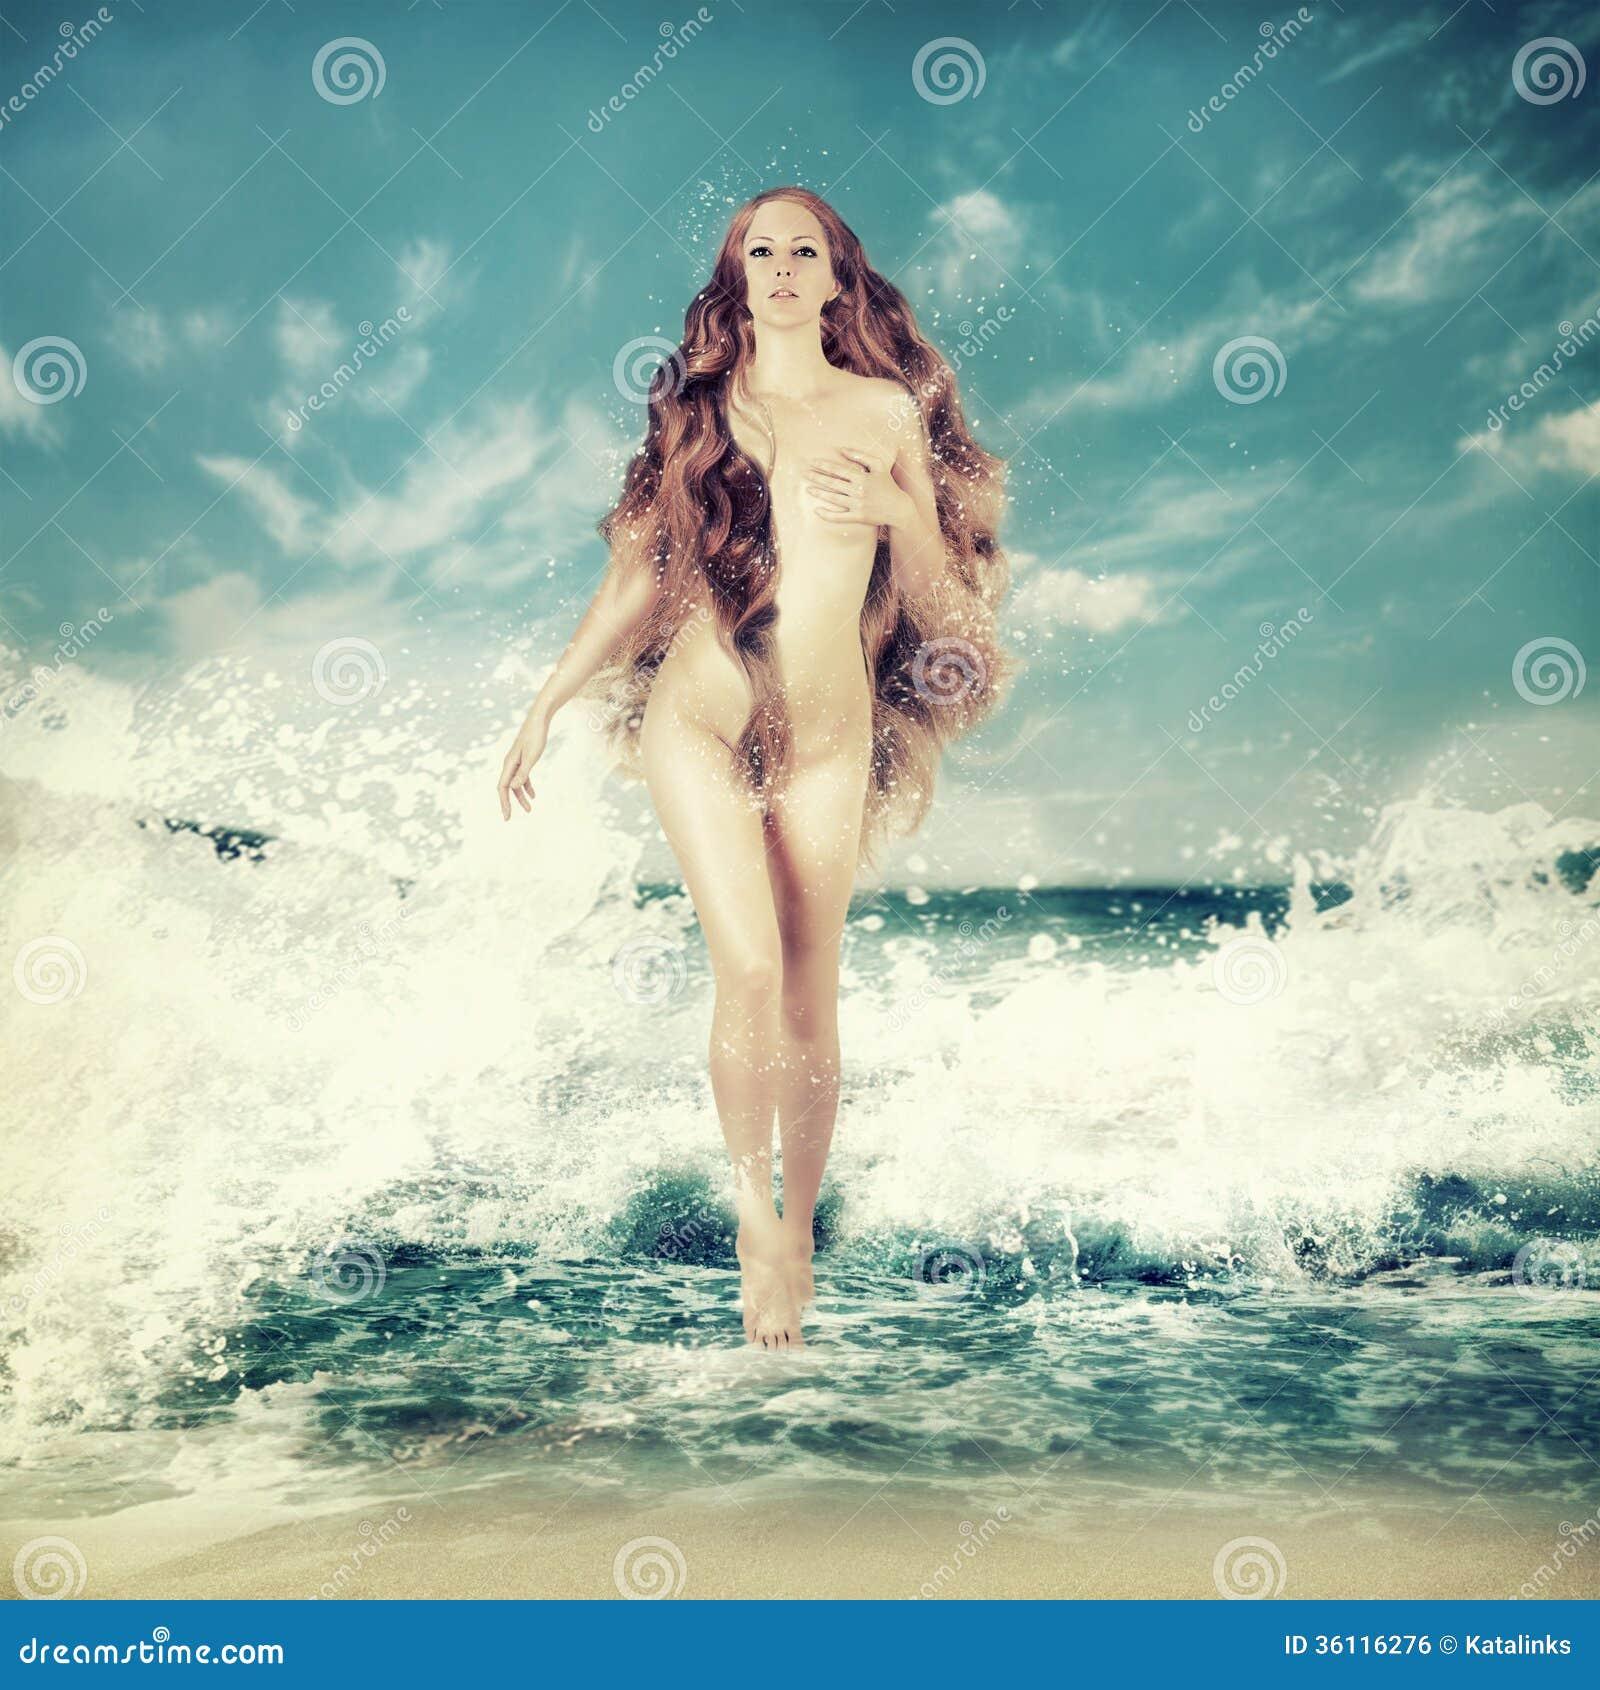 Very cute desi girl naked